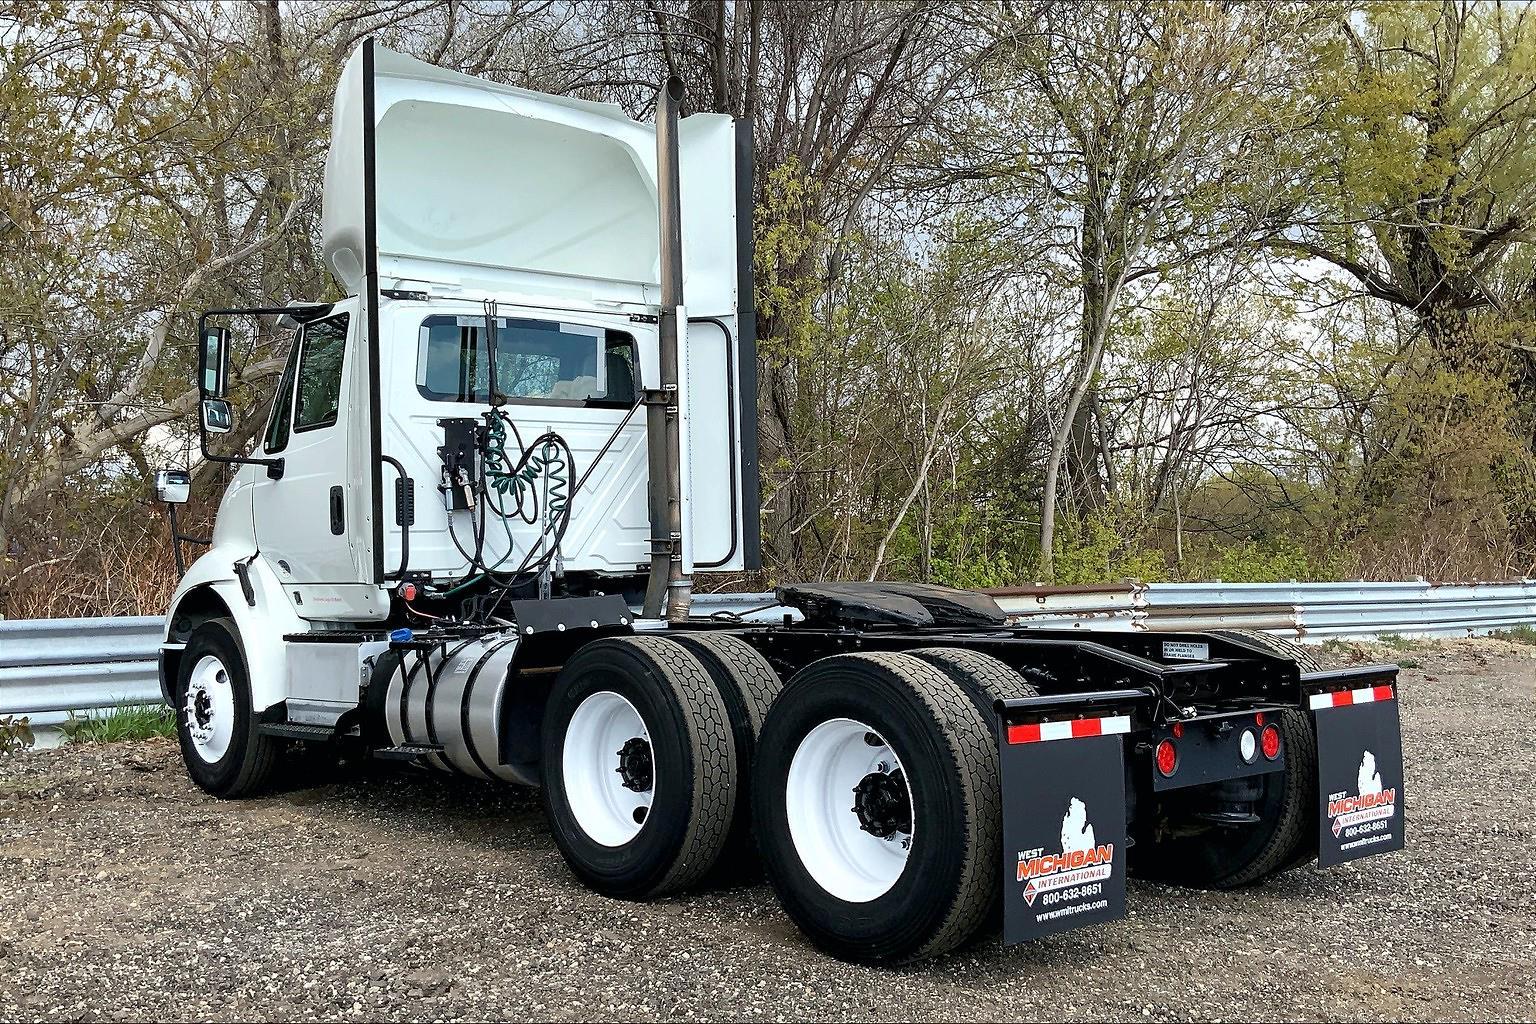 2016 International TranStar 8600 6x4, Tractor #GN372420 - photo 1